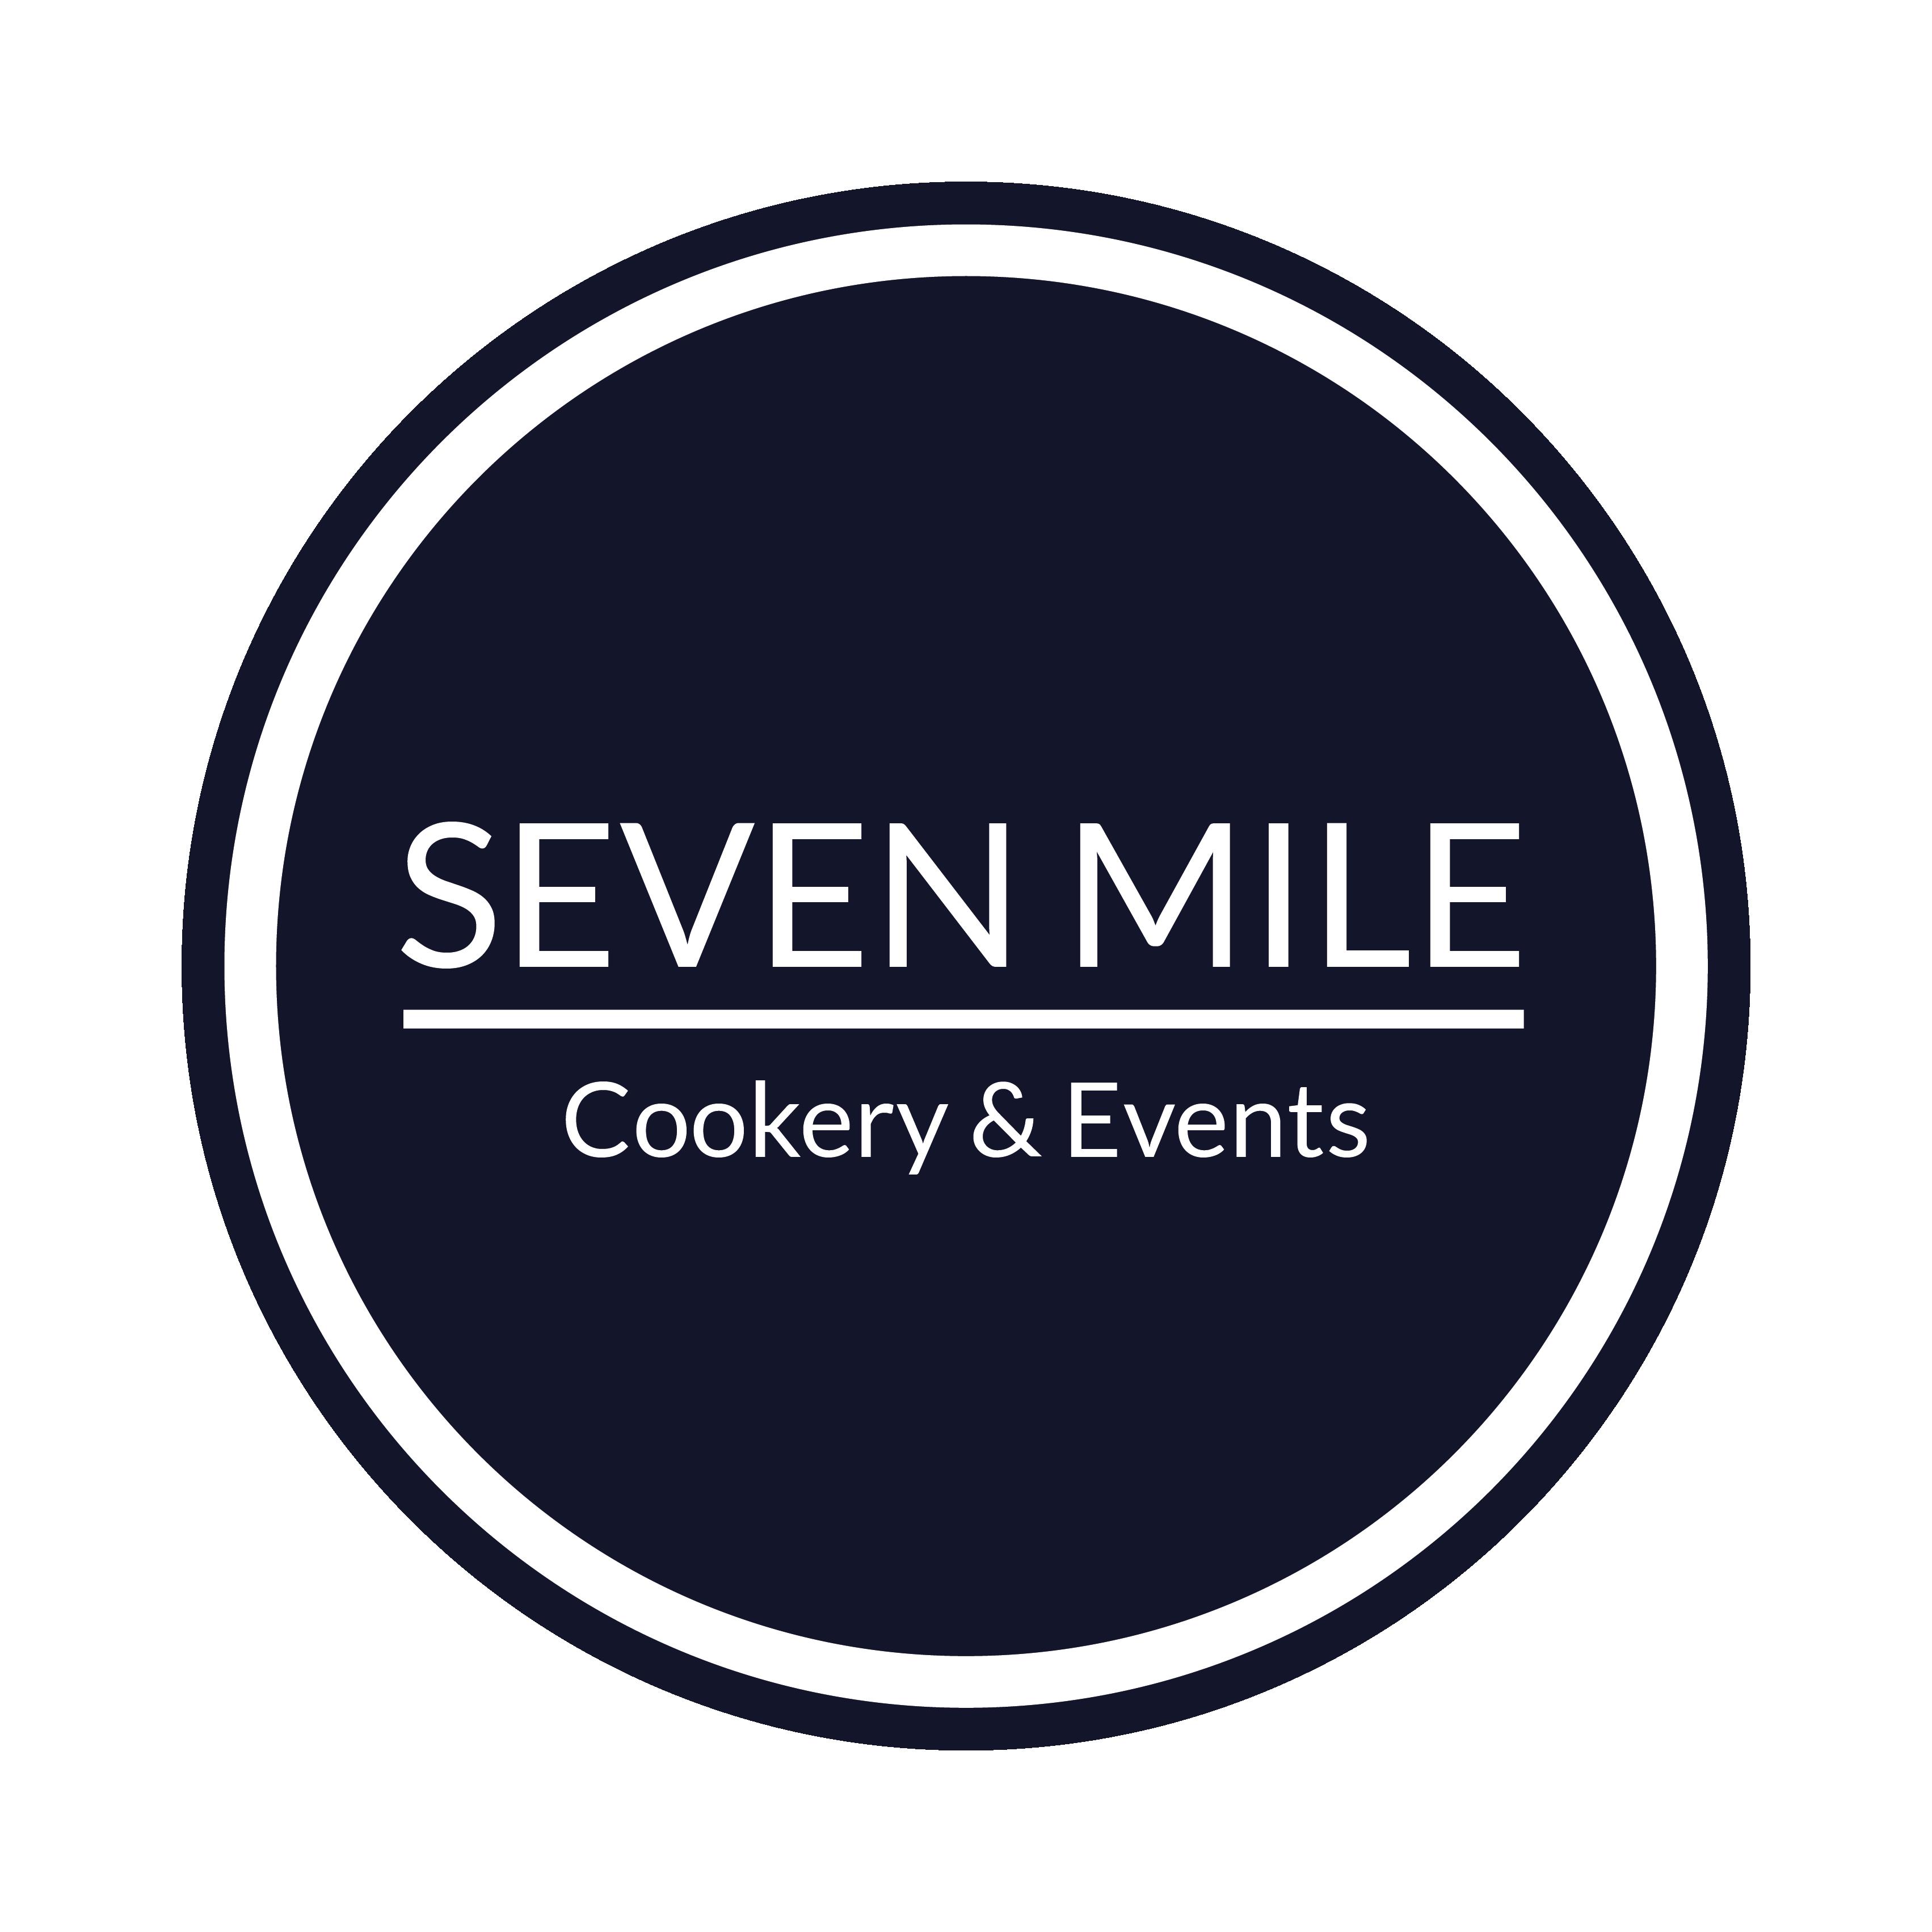 Seven Mile Cookery & Events Ltd